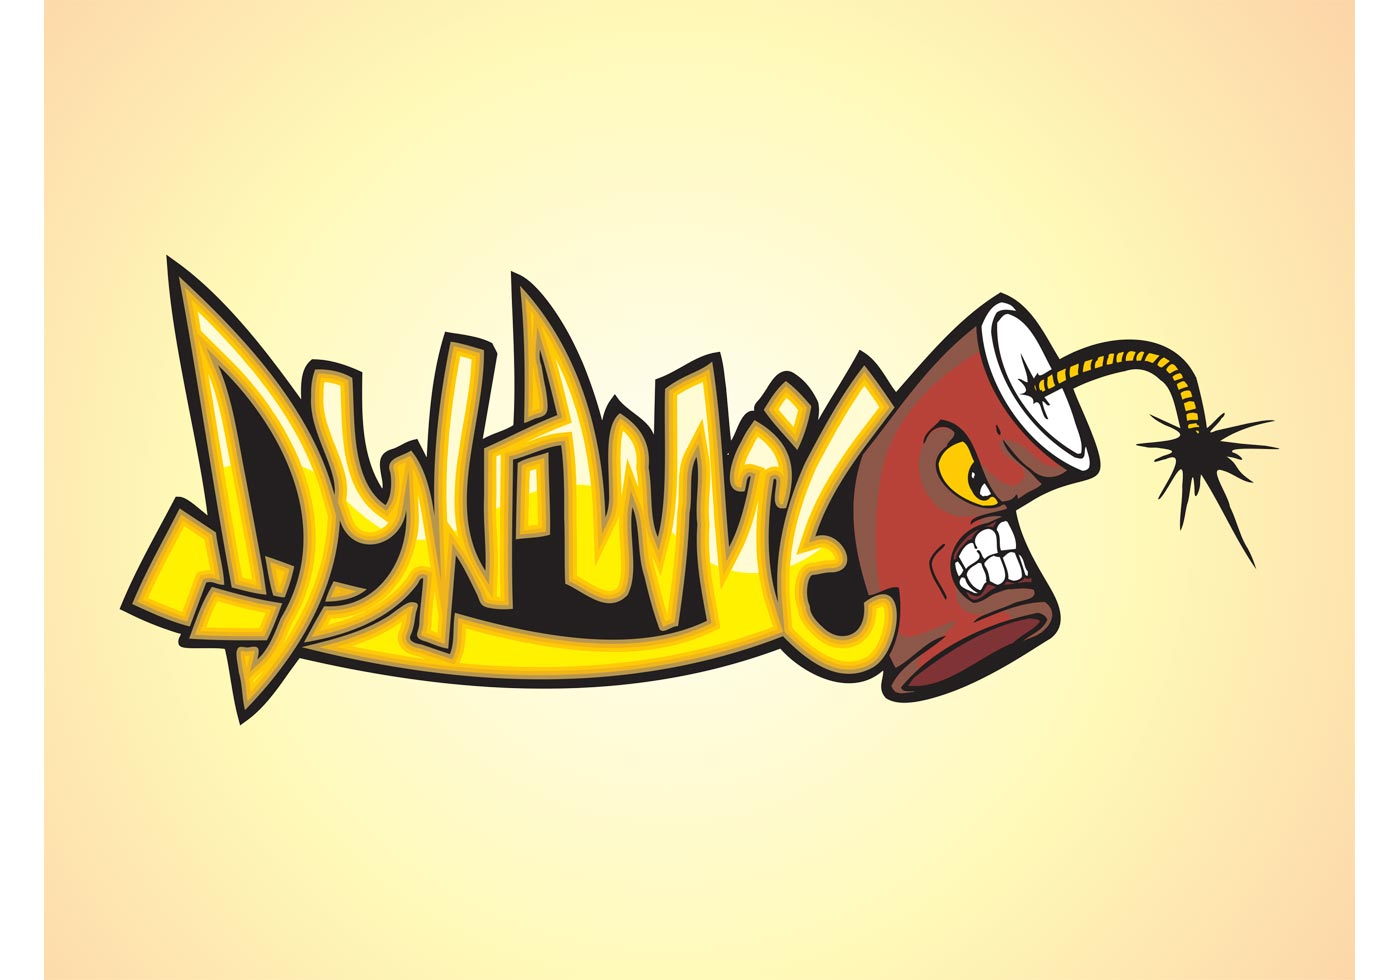 Dynamite Graffiti Piece Download Free Vector Art Stock